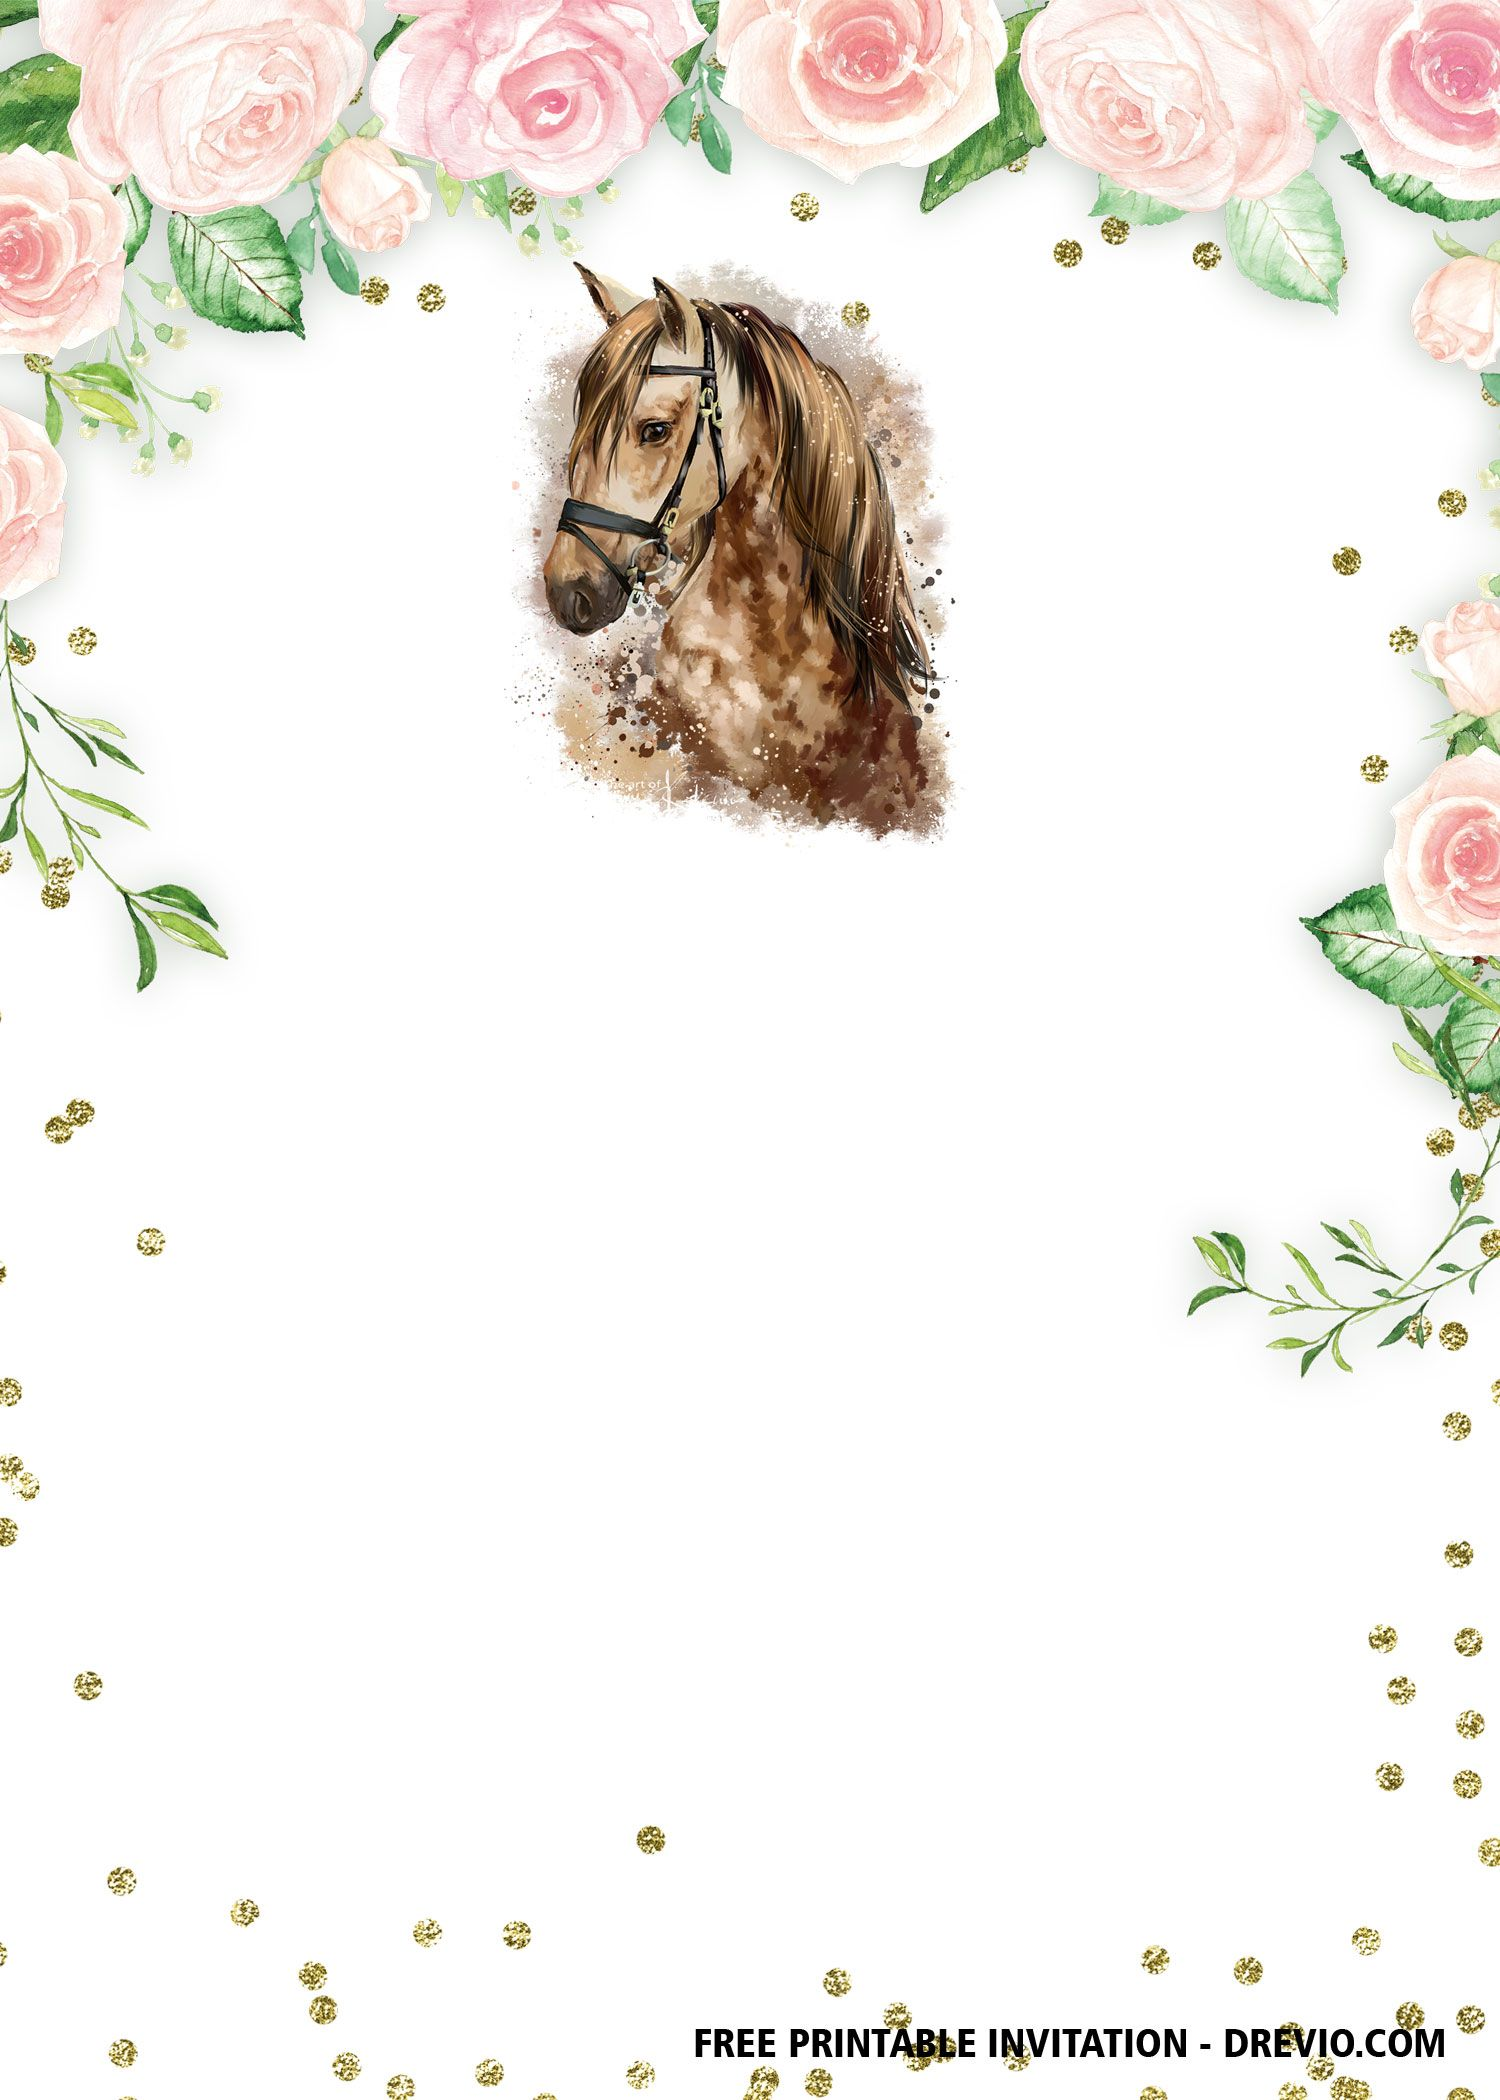 Free Printable Horse Floral Vintage Invitation Templates Horse Birthday Invitations Horse Birthday Horse Birthday Party Invitations